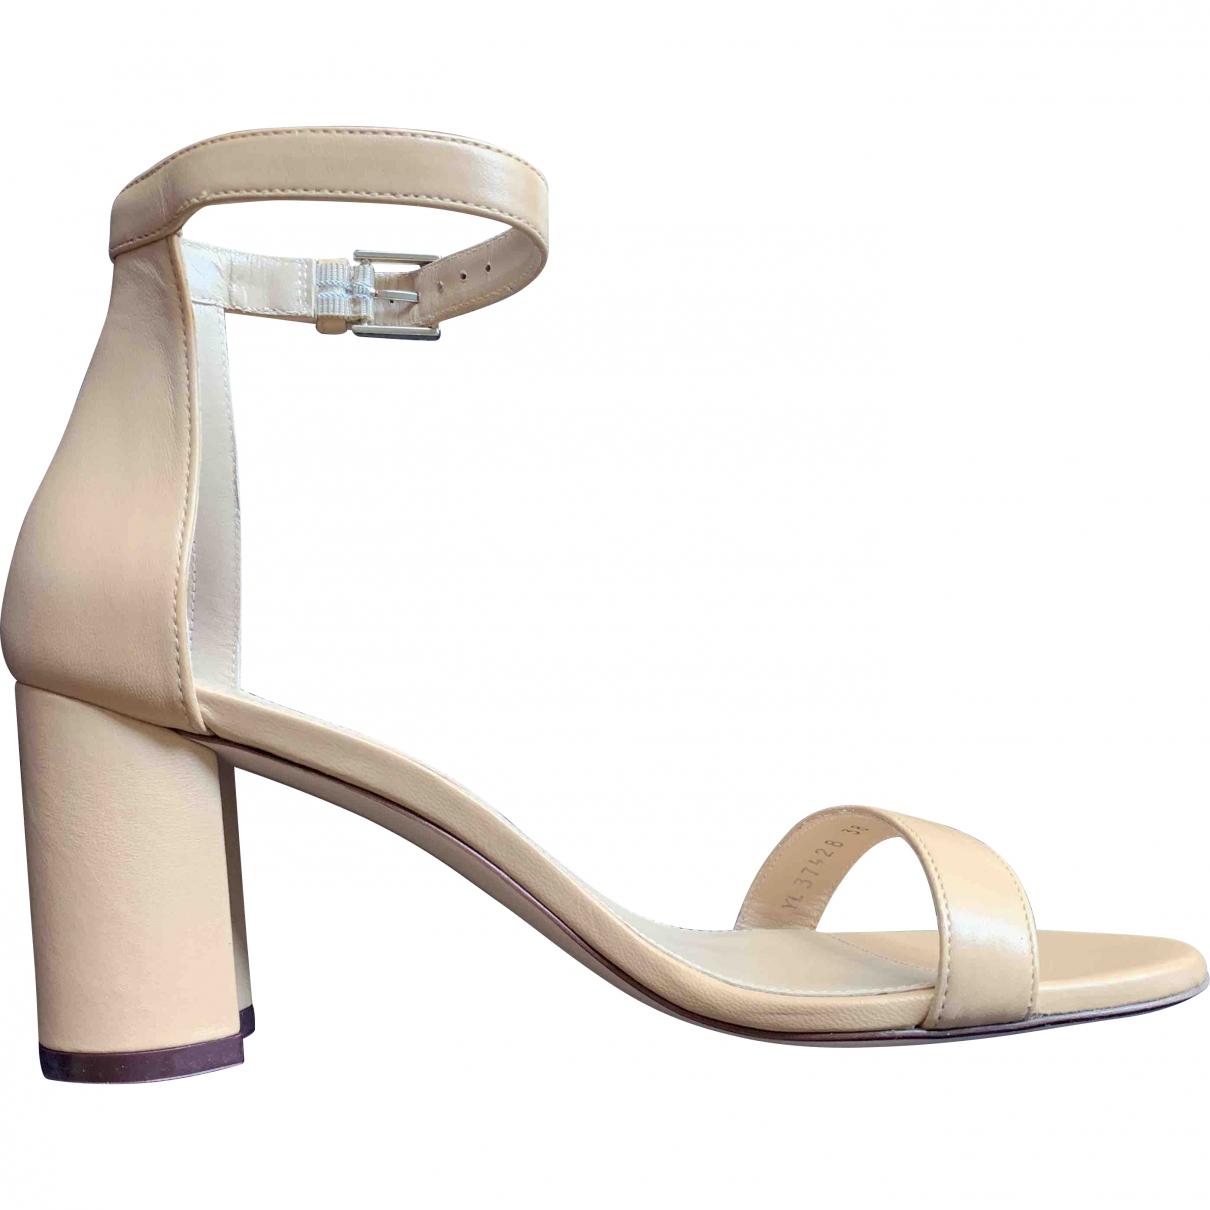 Stuart Weitzman \N Beige Leather Sandals for Women 38 EU